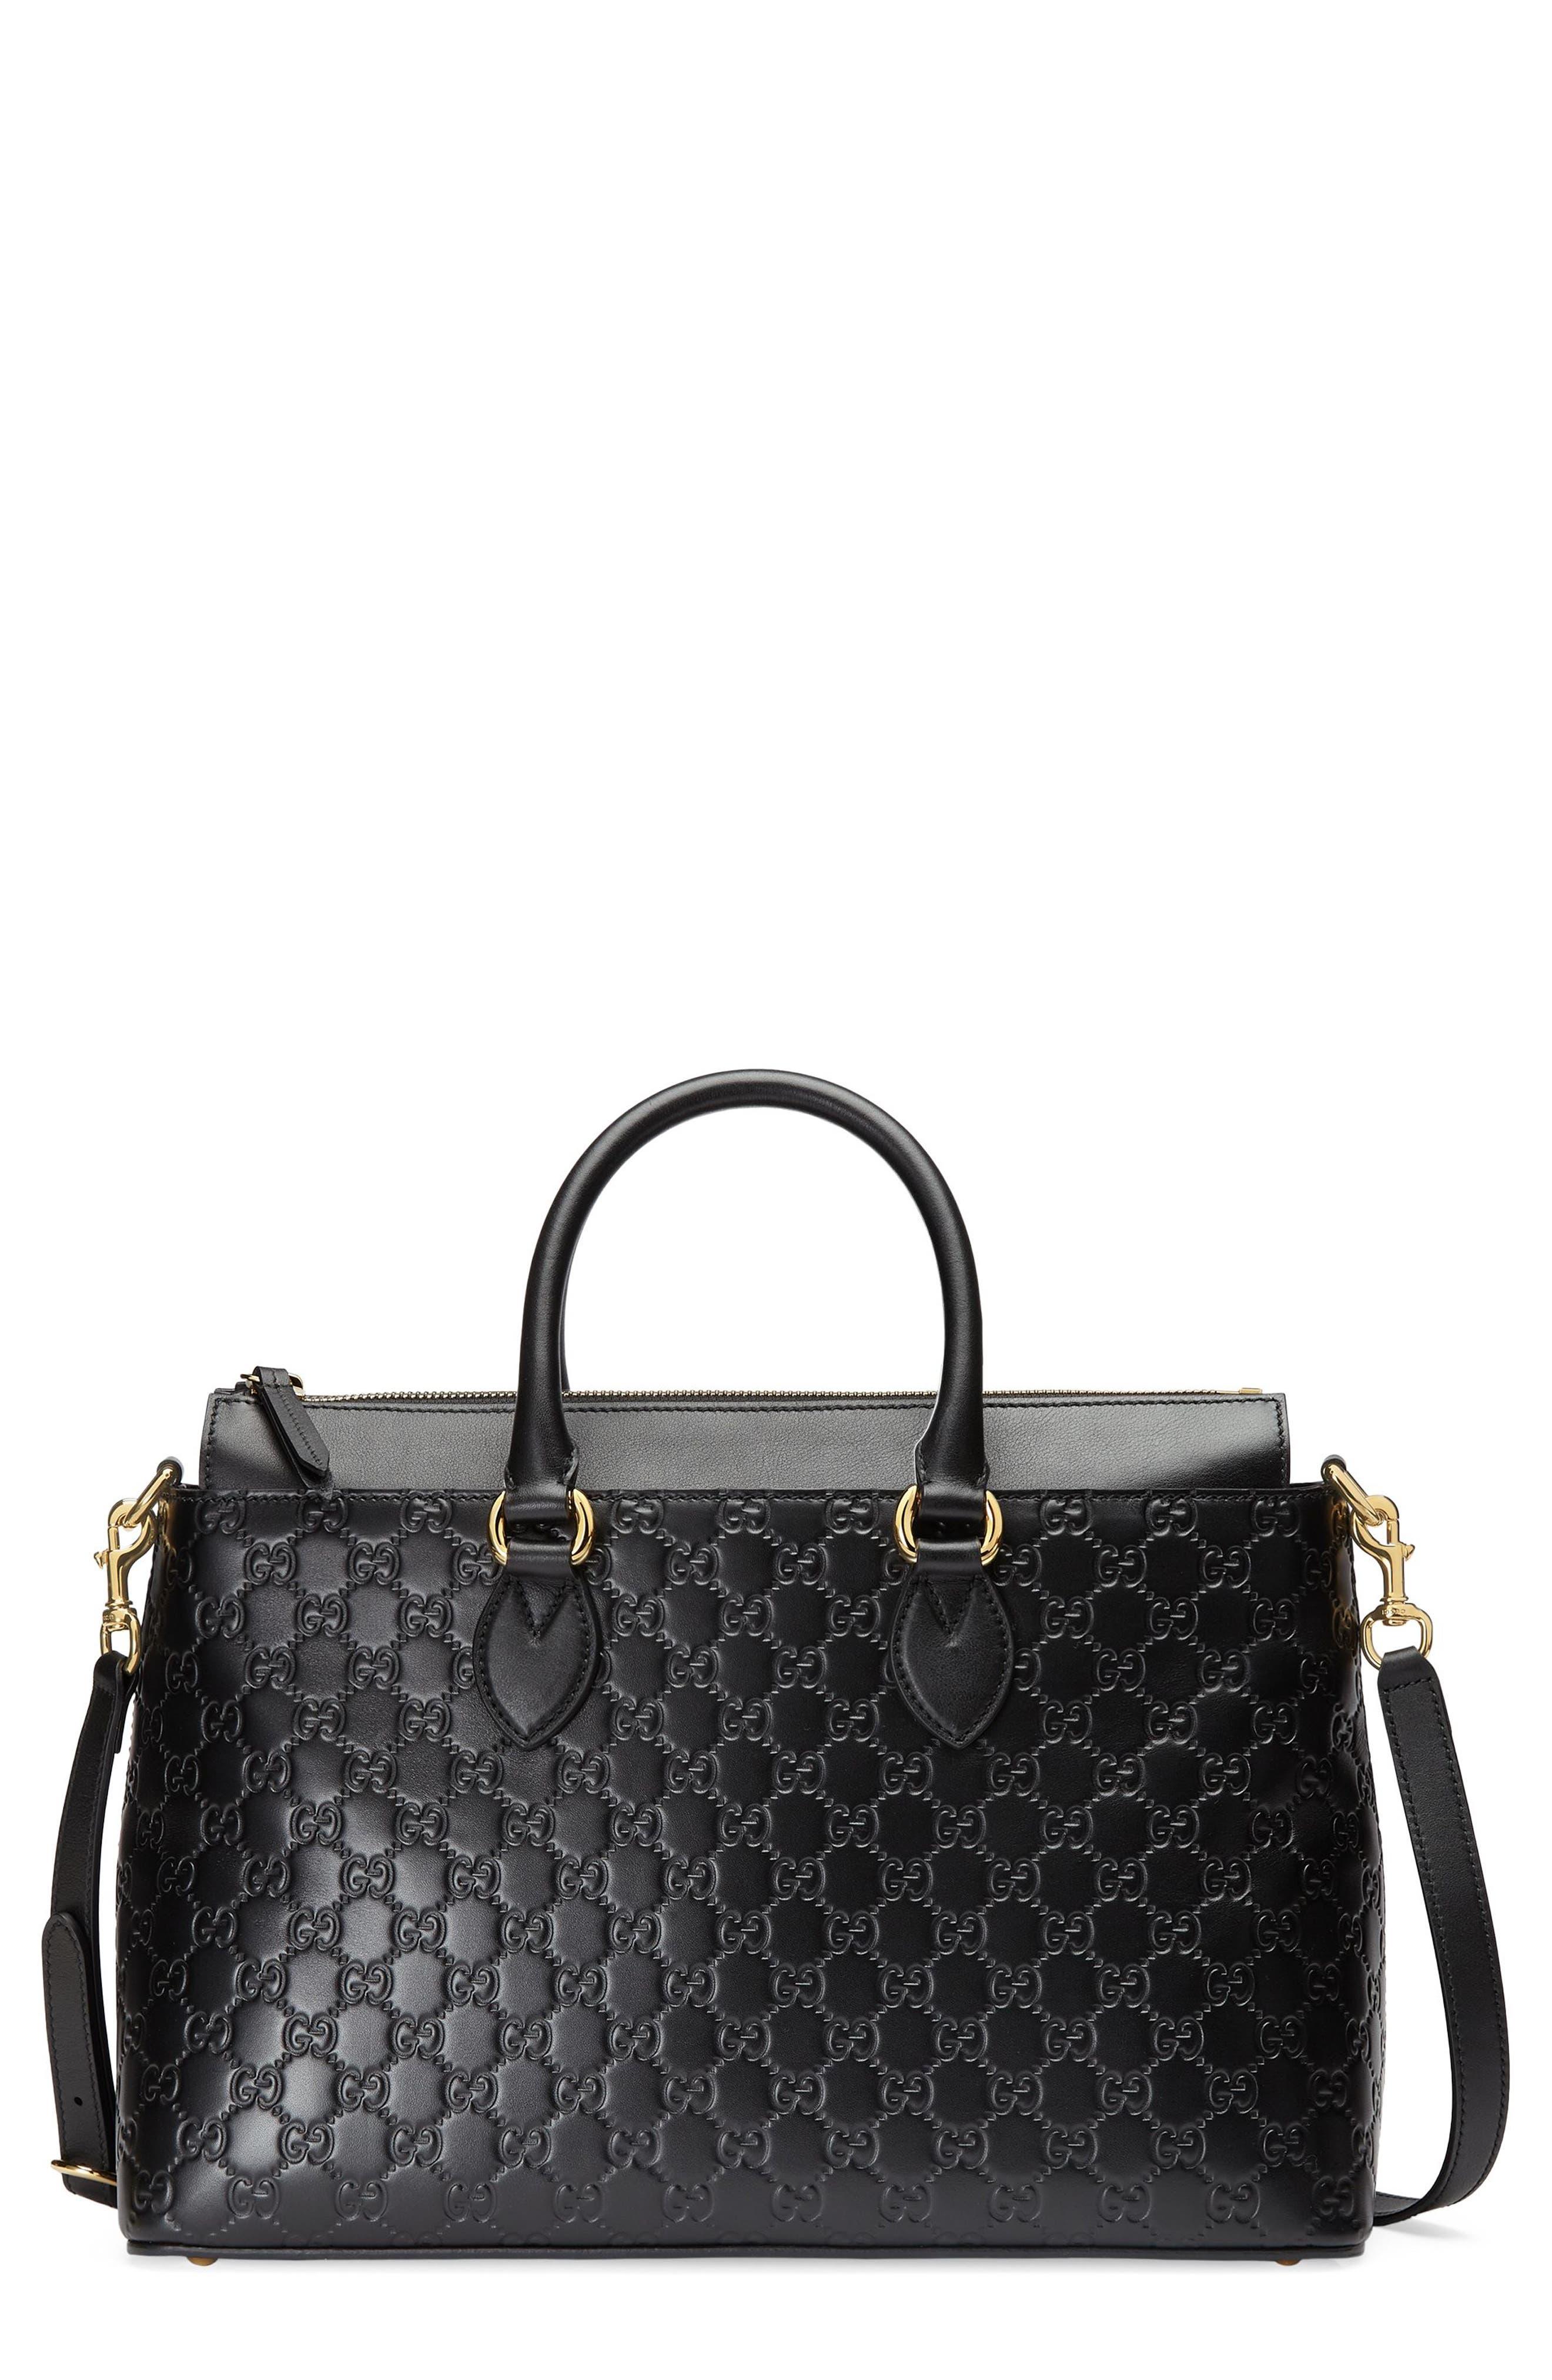 Main Image - Gucci Medium Top Handle Signature Leather Tote